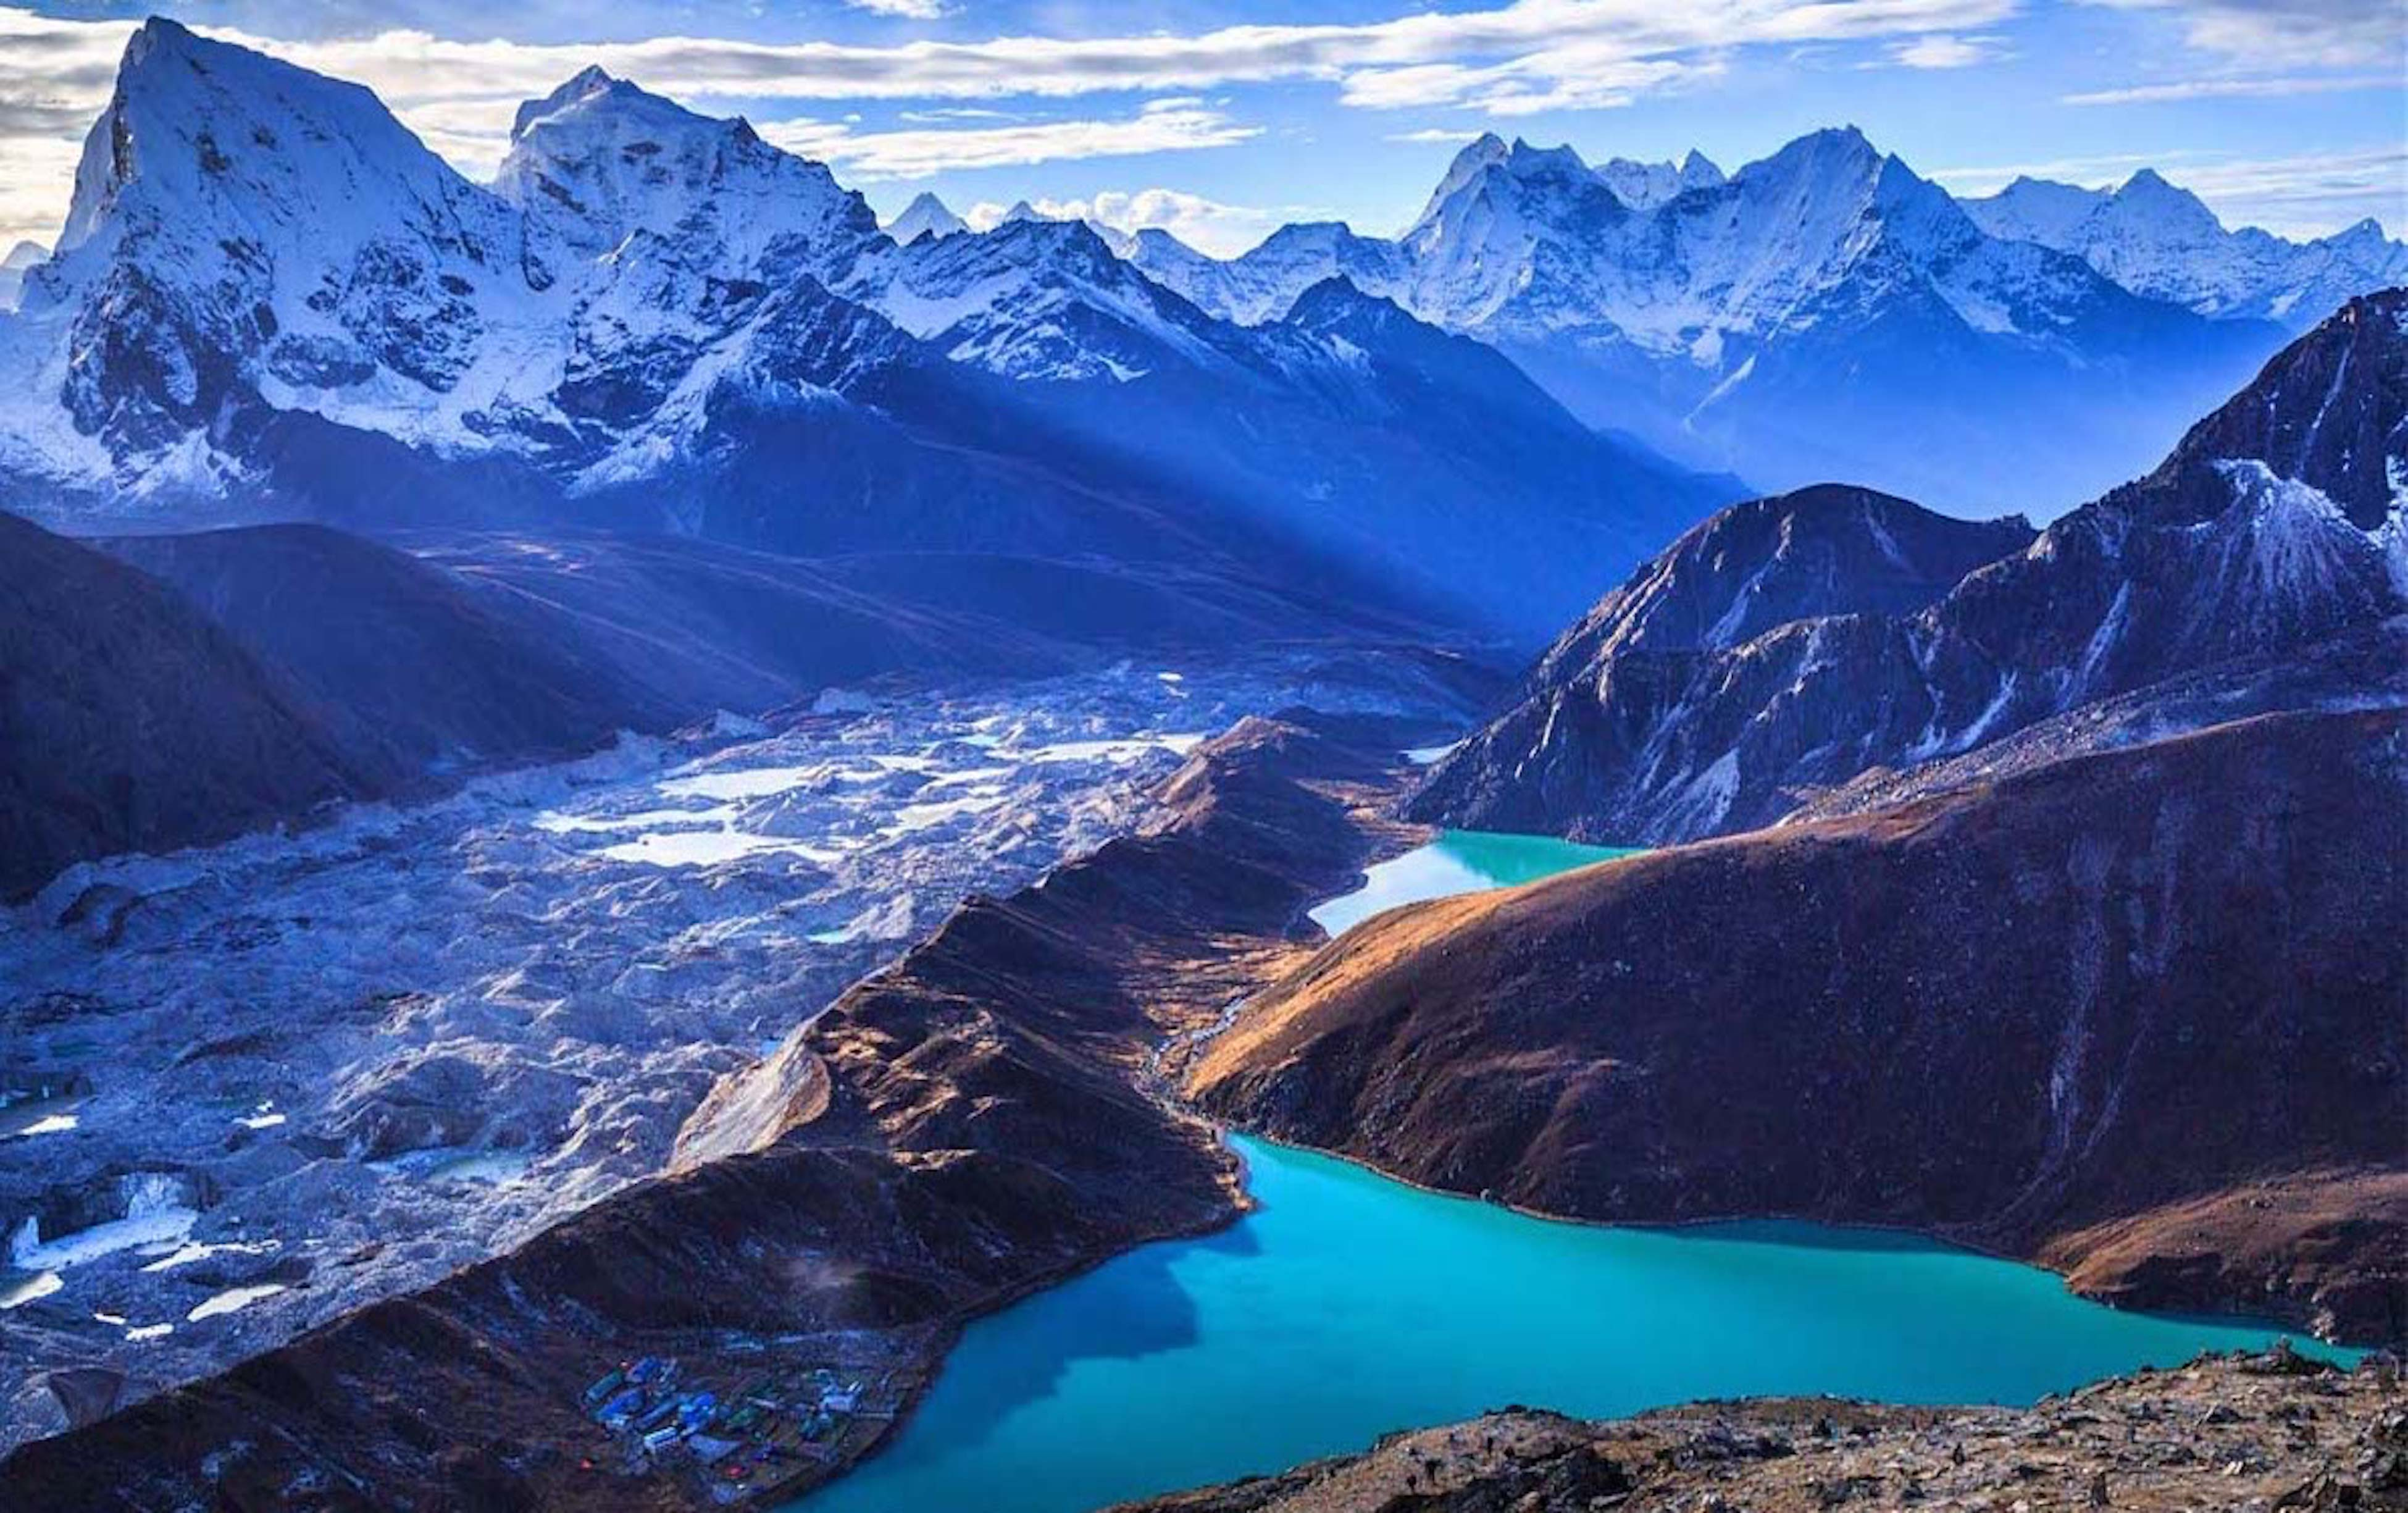 Everest base camp Cho-la pass trek.